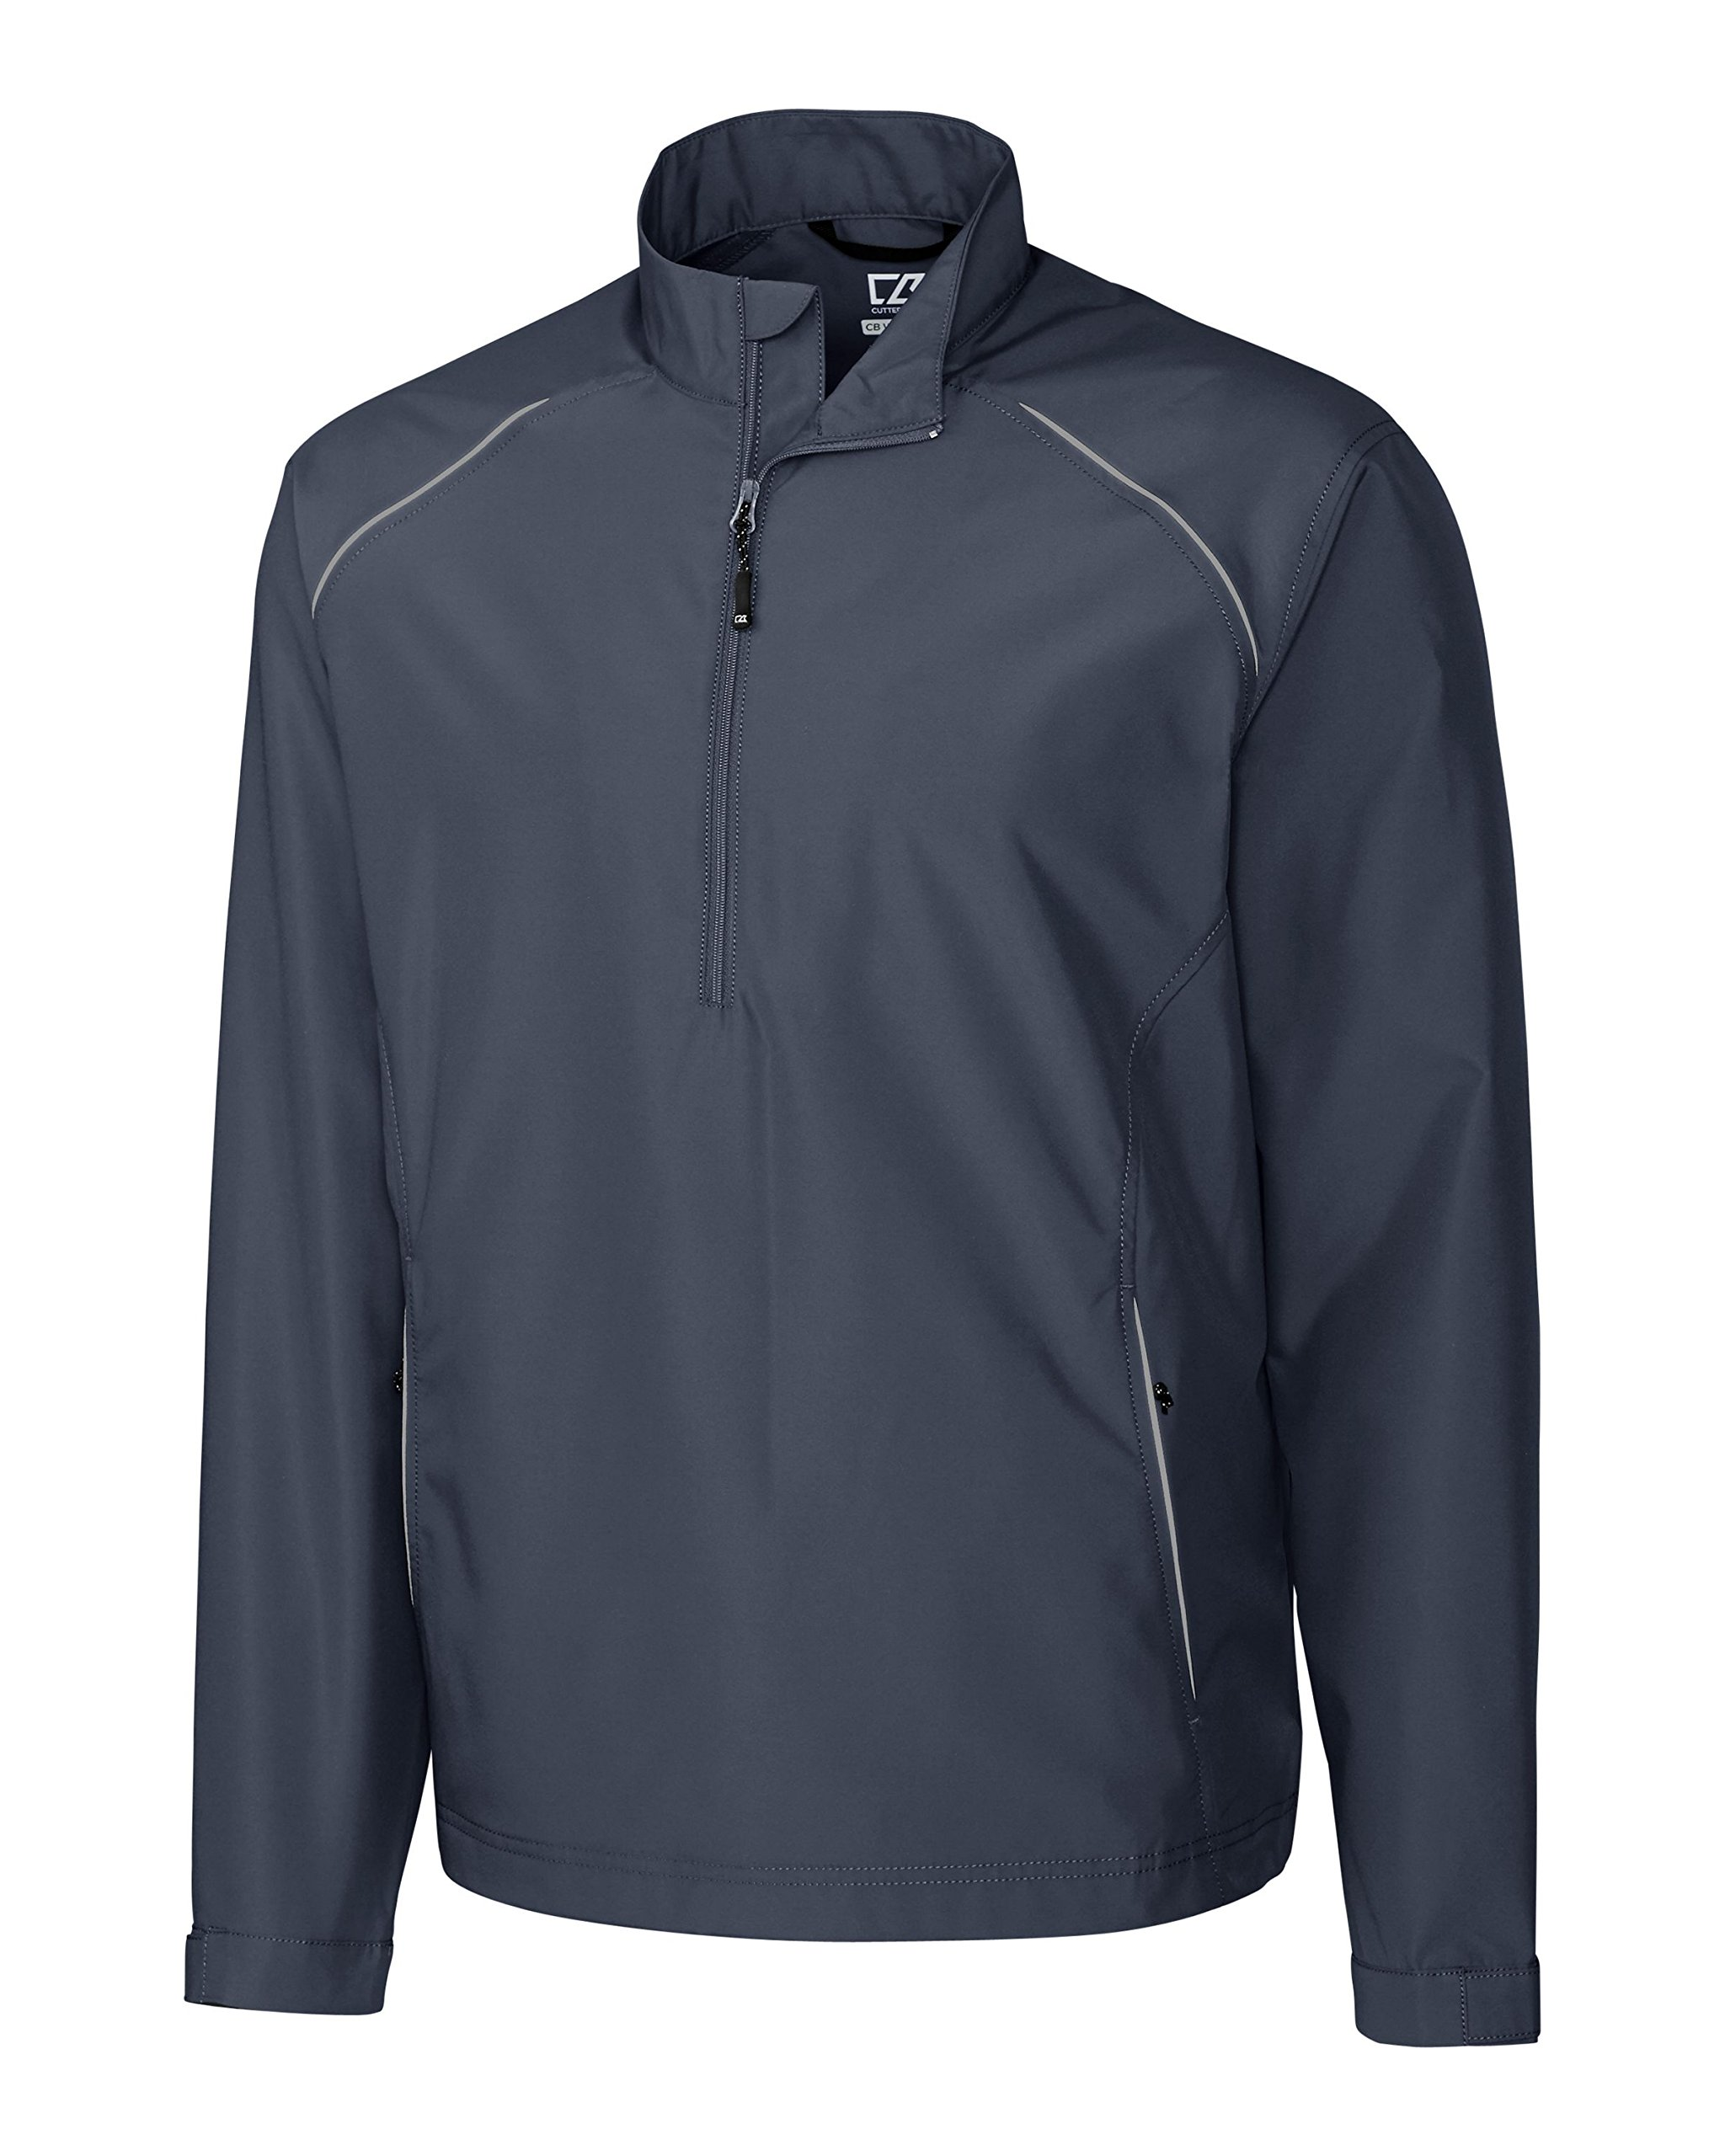 Cutter & Buck BCO00922 Mens Cb Weathertec Beacon Half Zip Jacket, Onyx-4XT